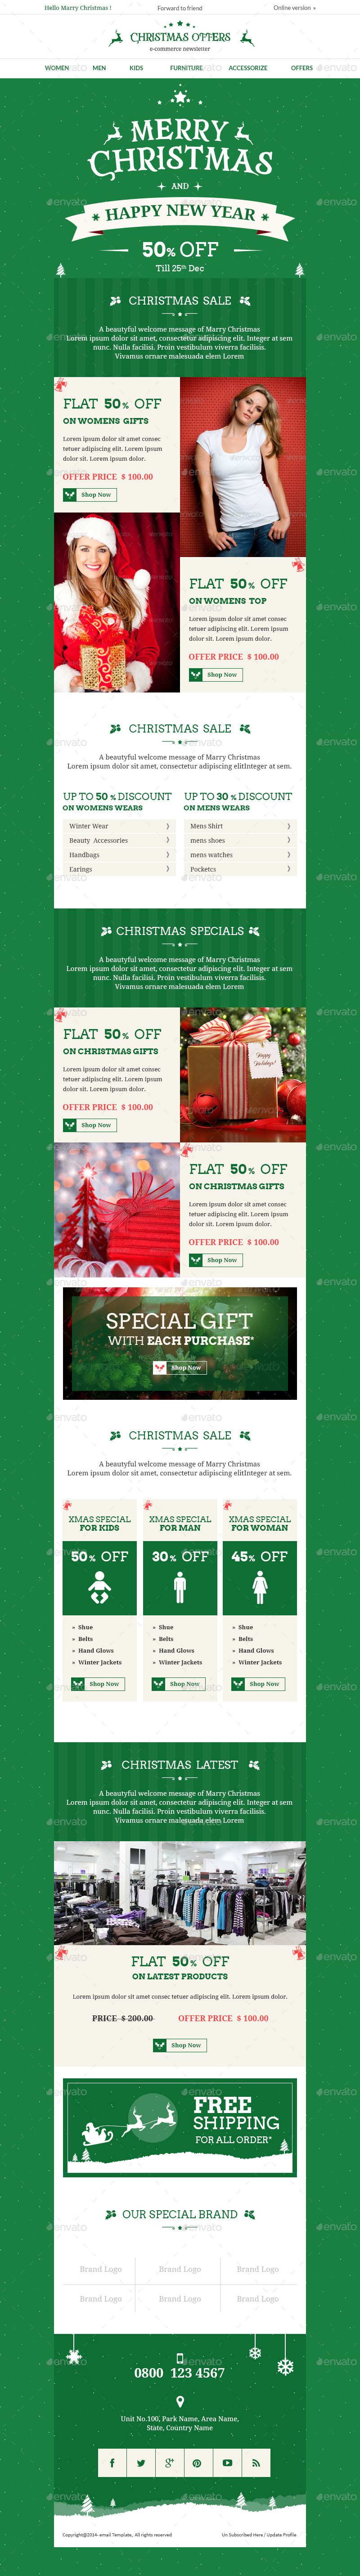 Christmas Offers E-commerce e-newsletter PSD Template by aksharthemes